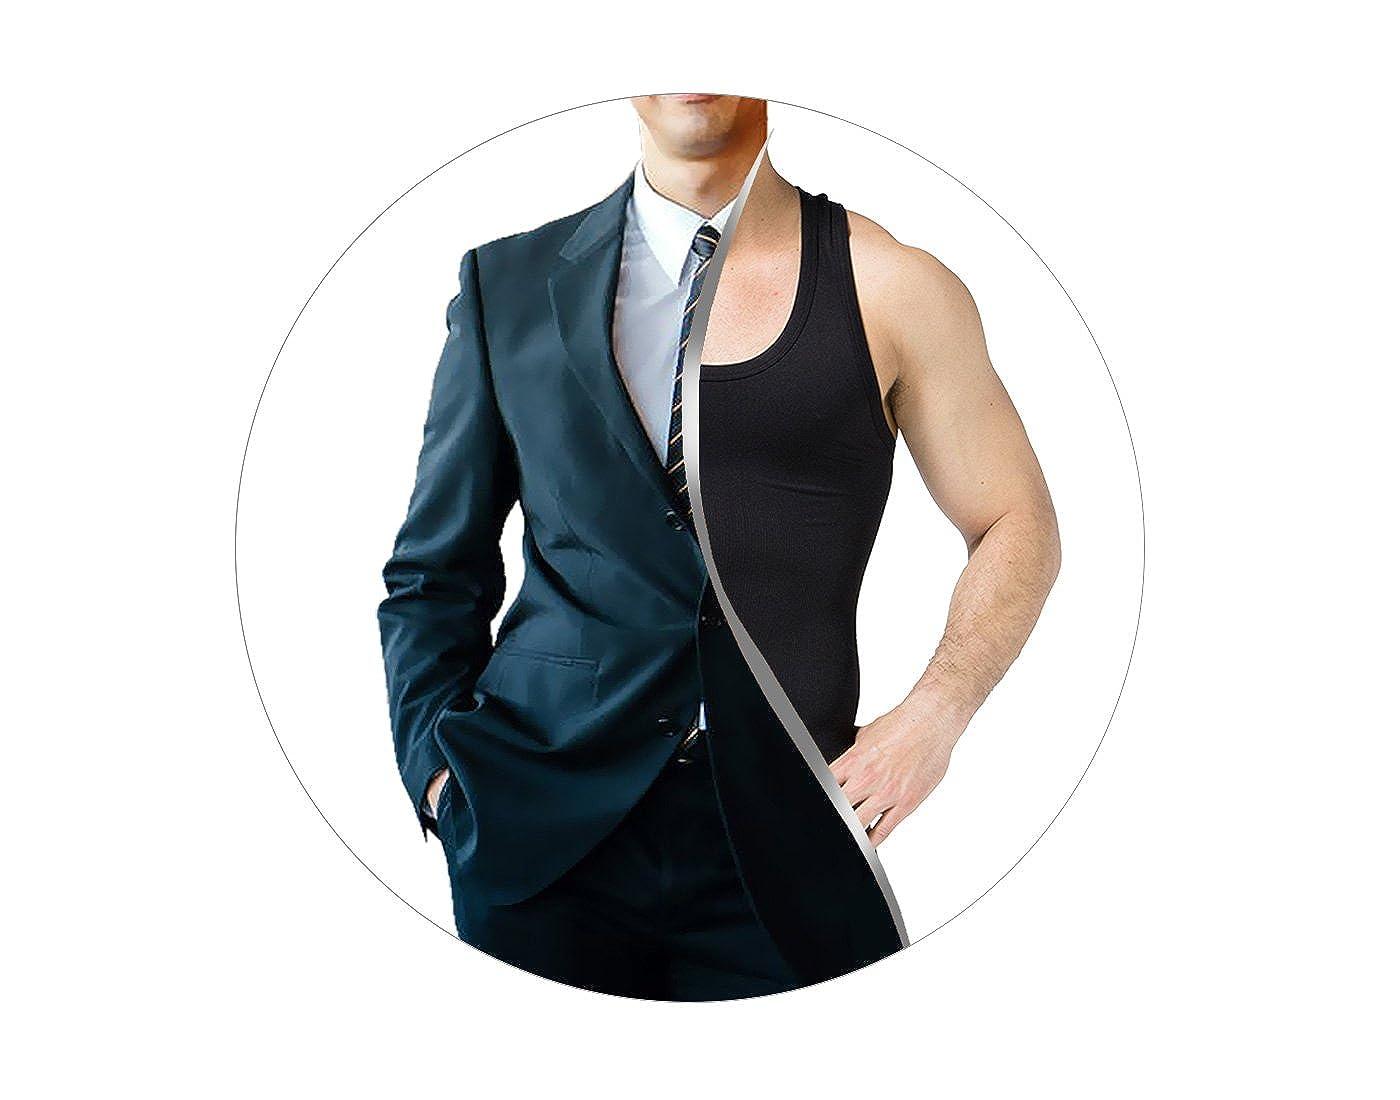 FEOYA - Chaleco Interior sin Costura con Faja Abdominal para Hombre  Reductora Adelgazante Suave Transpirable Absorción Ampliar imagen 28c59bdeaa2d